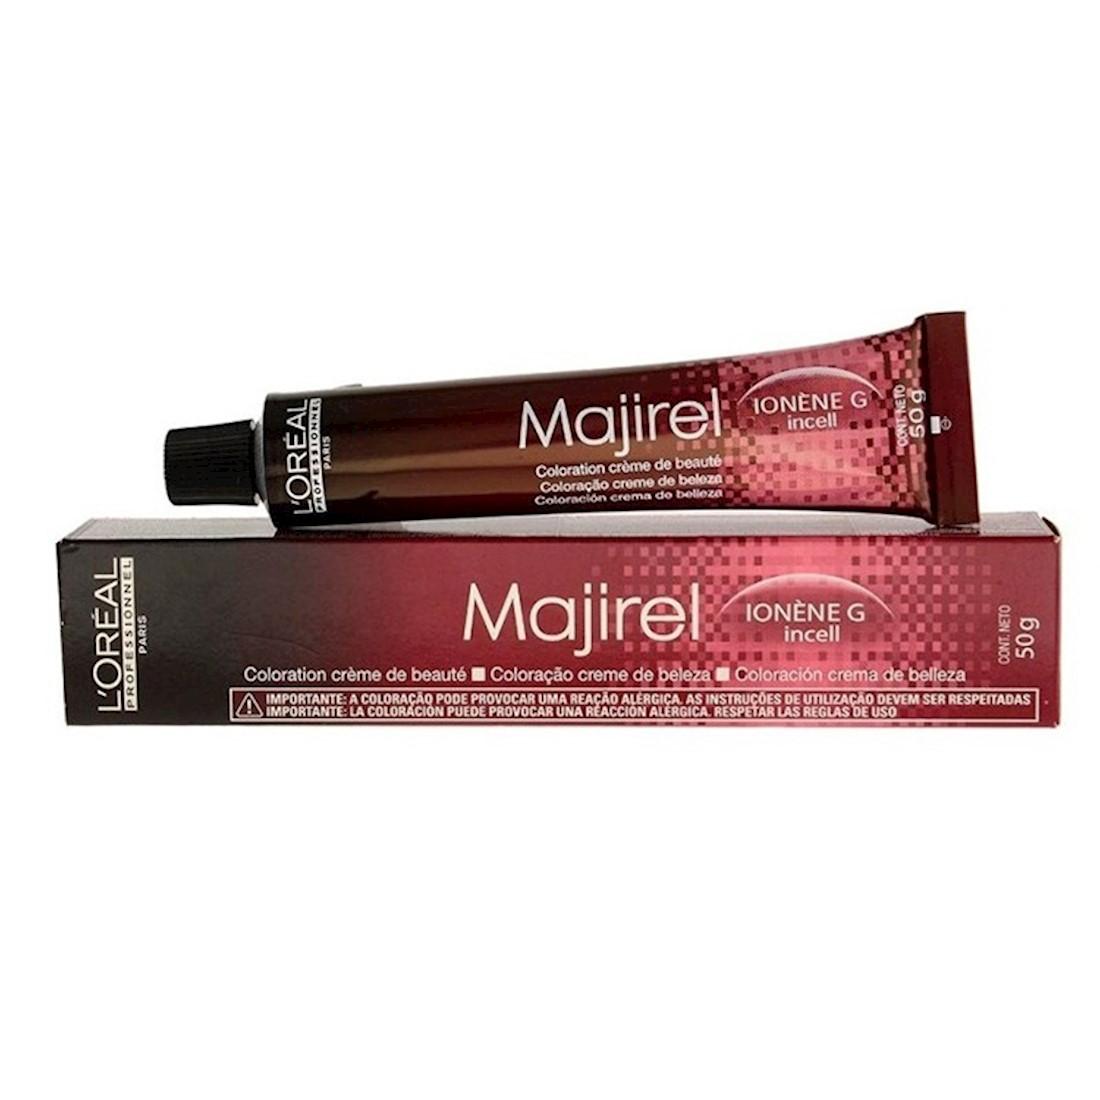 Coloração Majirel 5,0 (Castanho natural profundo) da L'Oreal 50g Bisnaga